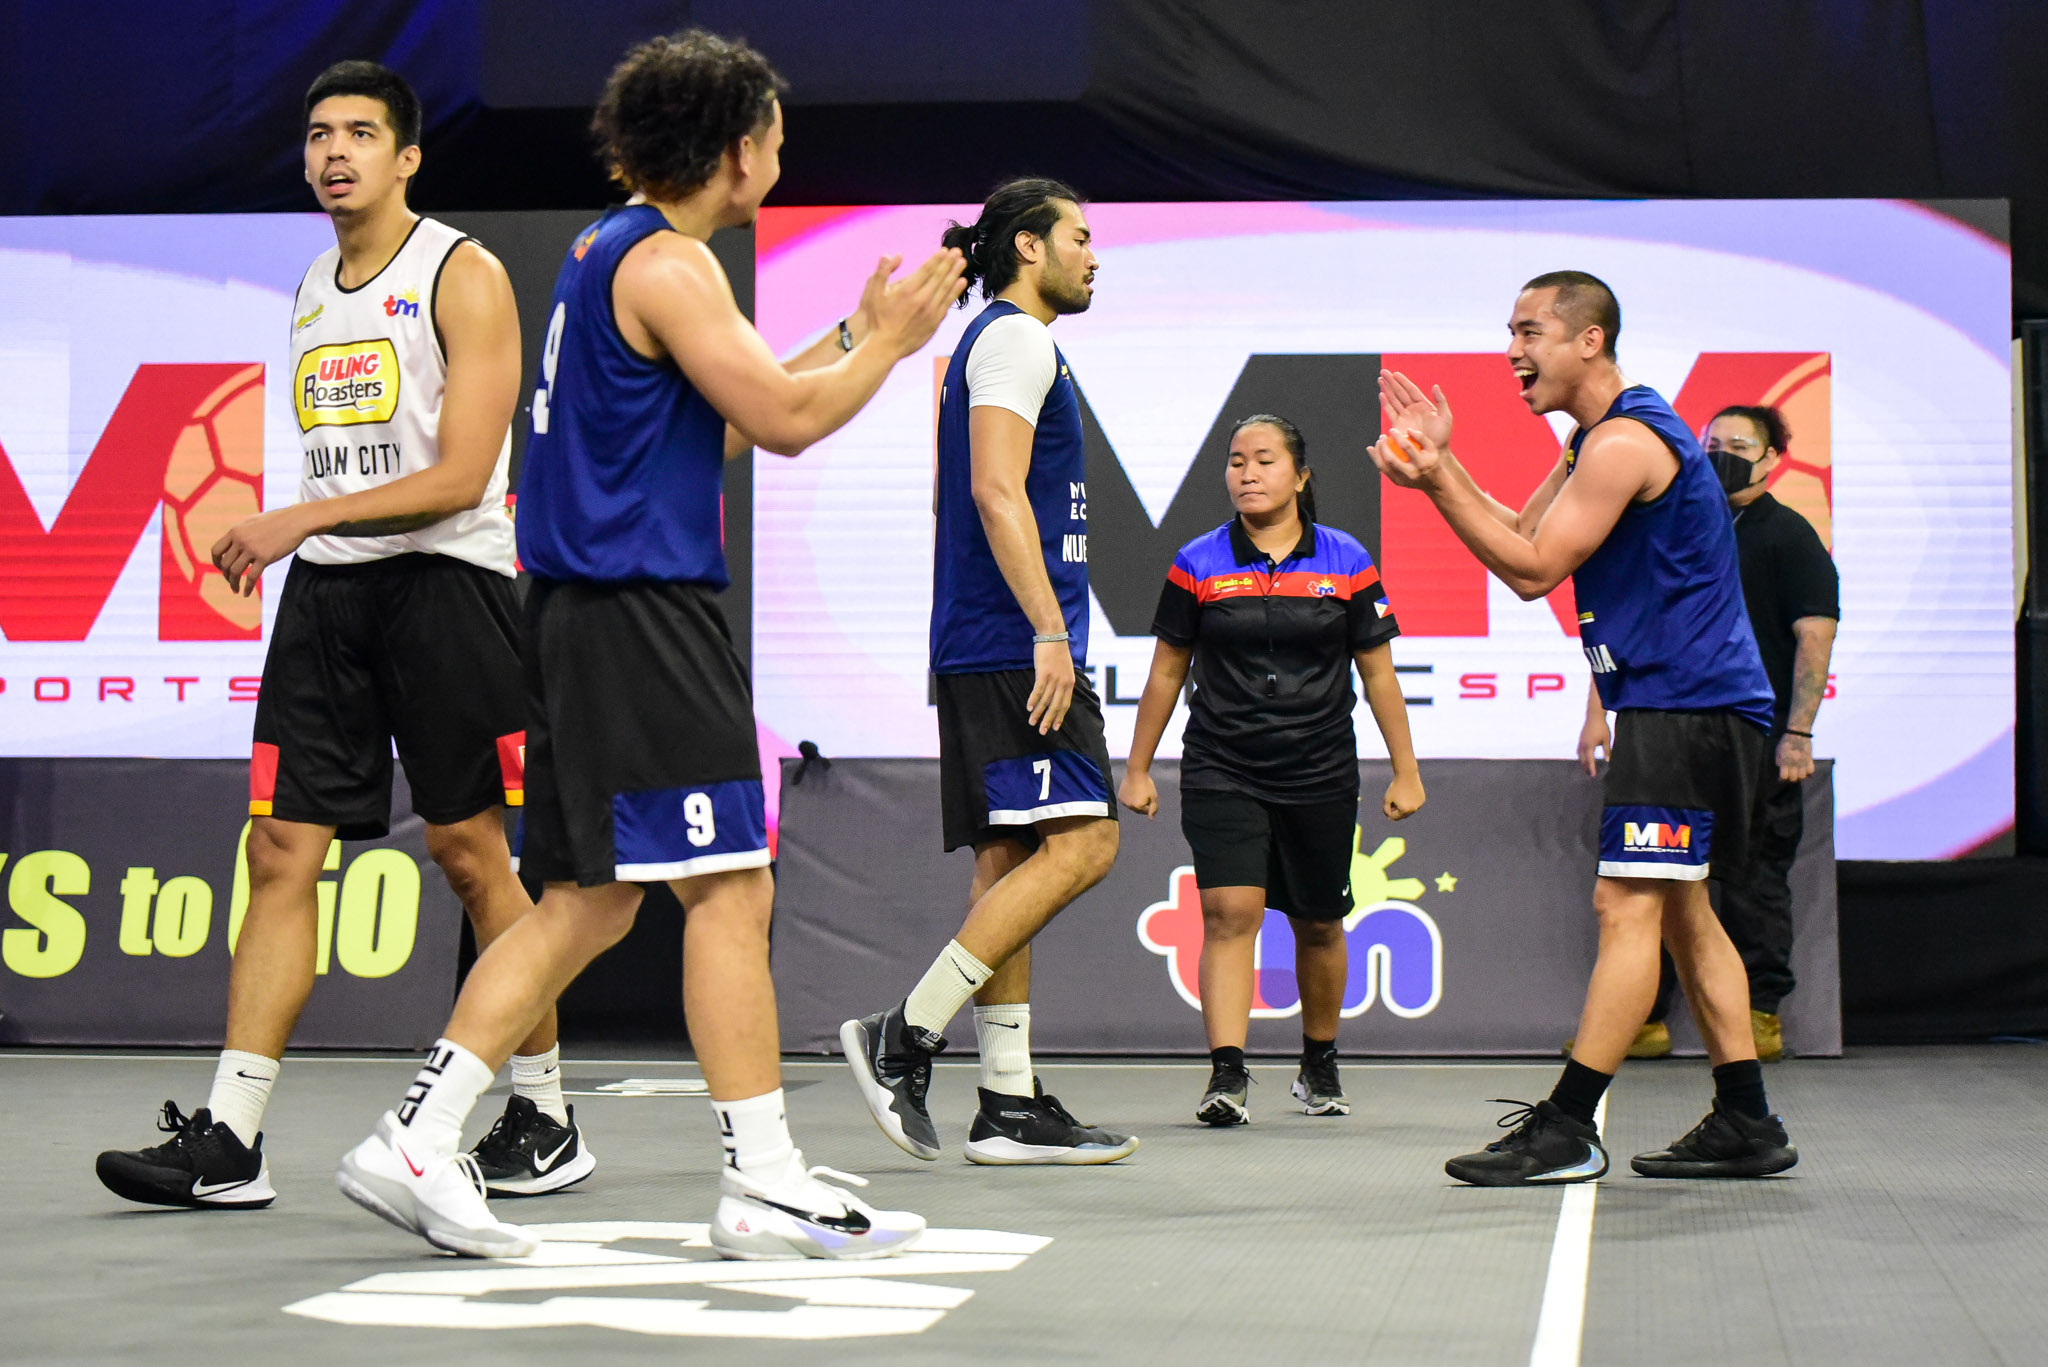 4-Chooks-to-Go-Pilipinas-3X3-Nueva-Ecija-vs-Butuan-Scuffle-4 Franky Johnson can't wait for Butuan-Nueva Ecija rematch 3x3 Basketball Chooks-to-Go Pilipinas 3x3 News  - philippine sports news